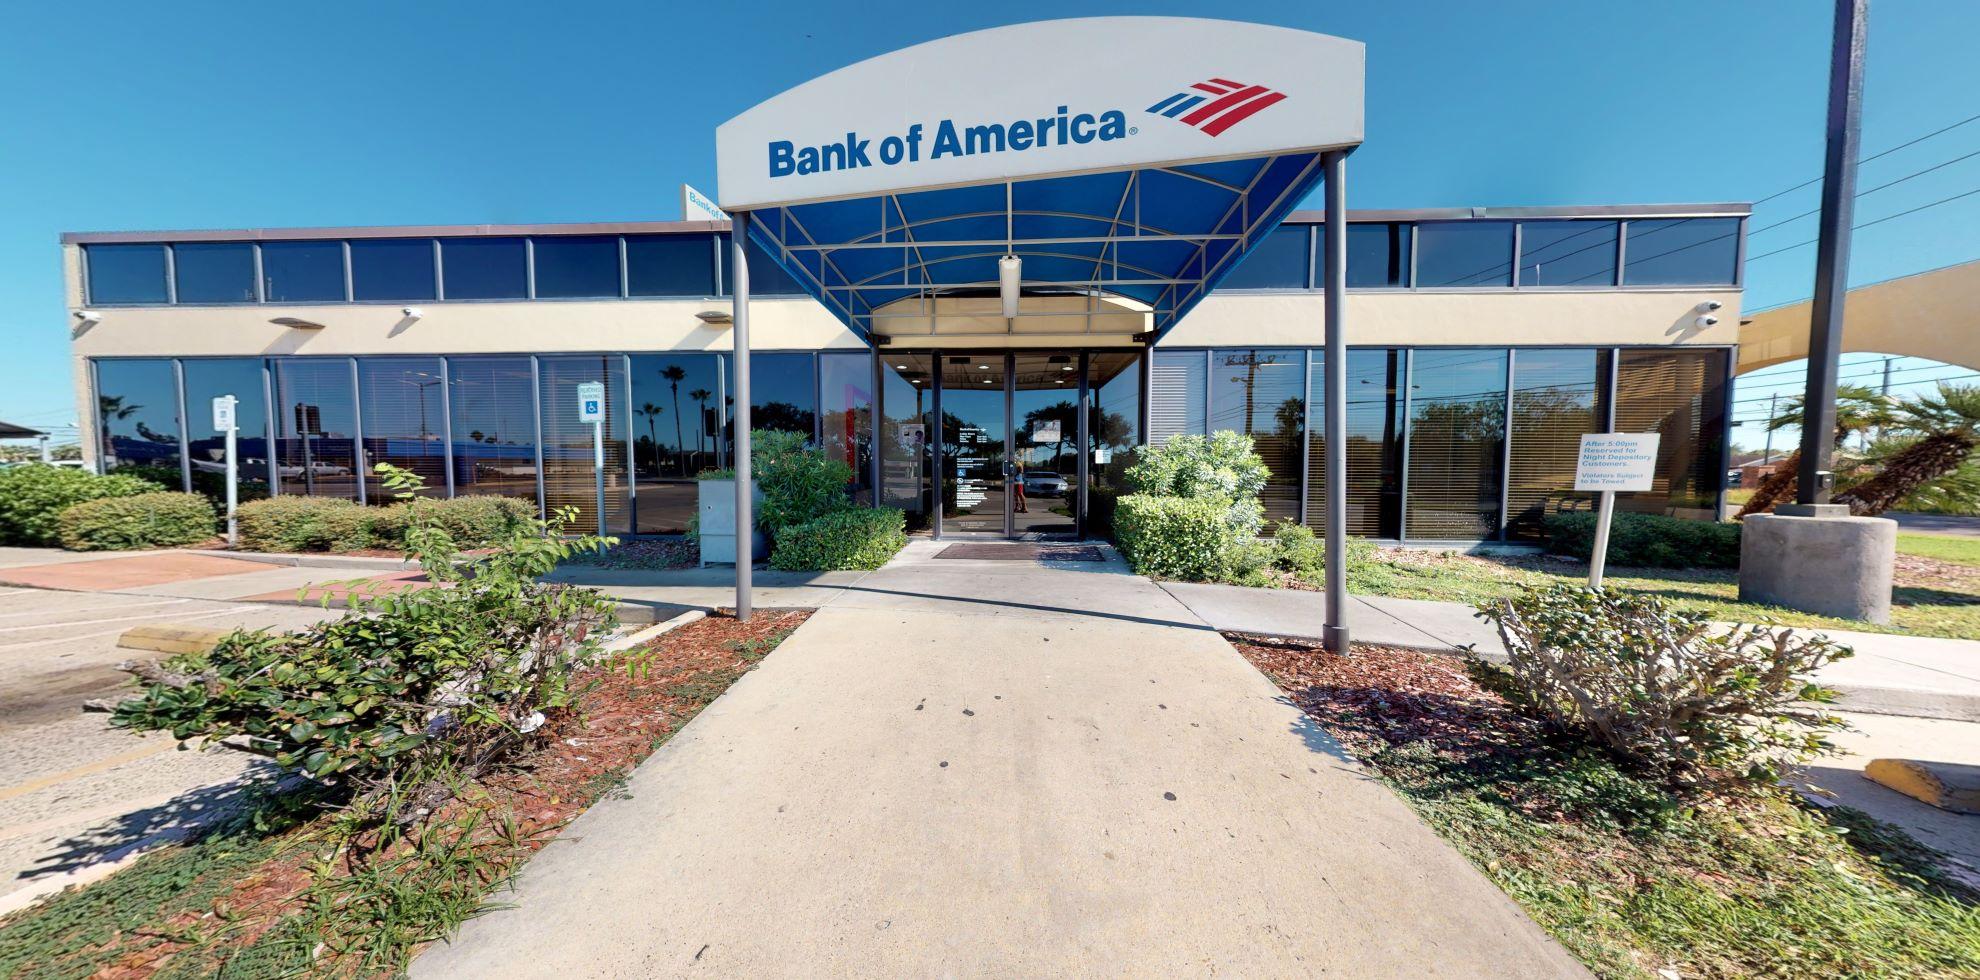 Bank of America financial center with drive-thru ATM | 5875 Weber Rd, Corpus Christi, TX 78413